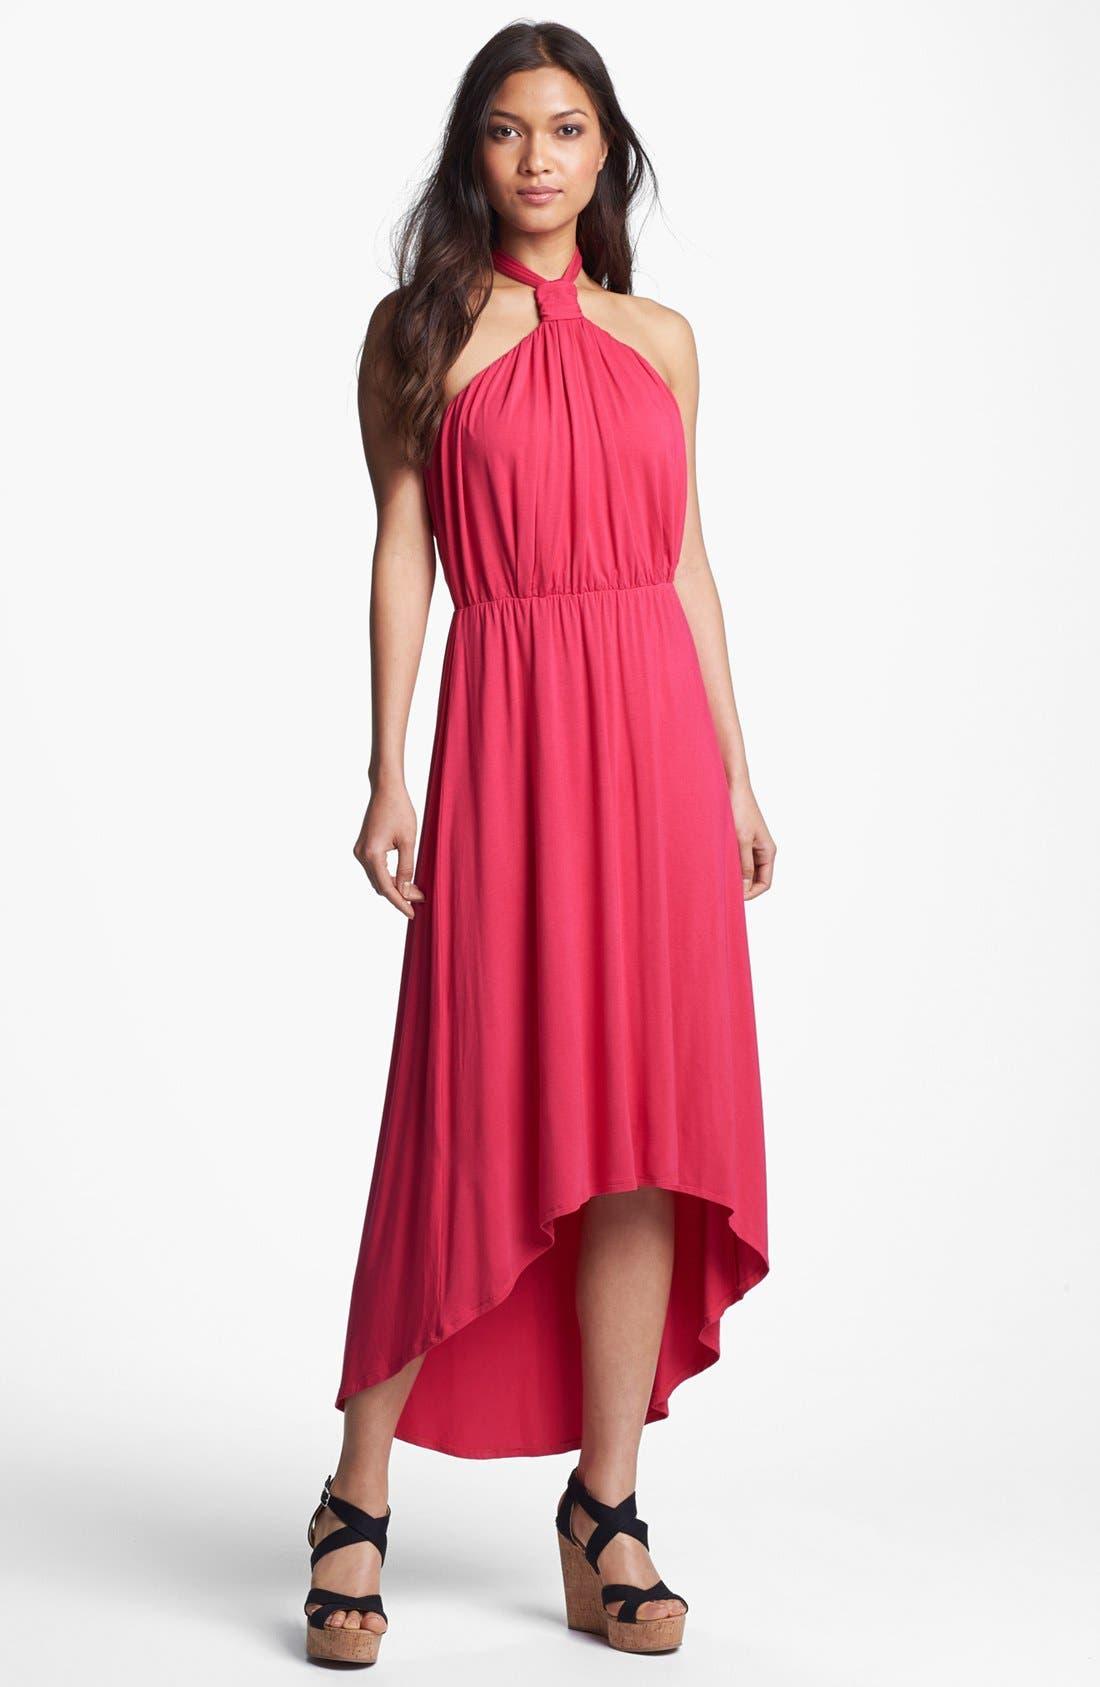 Main Image - Felicity & Coco Halter High/Low Maxi Dress (Regular & Petite) (Nordstrom Exclusive)